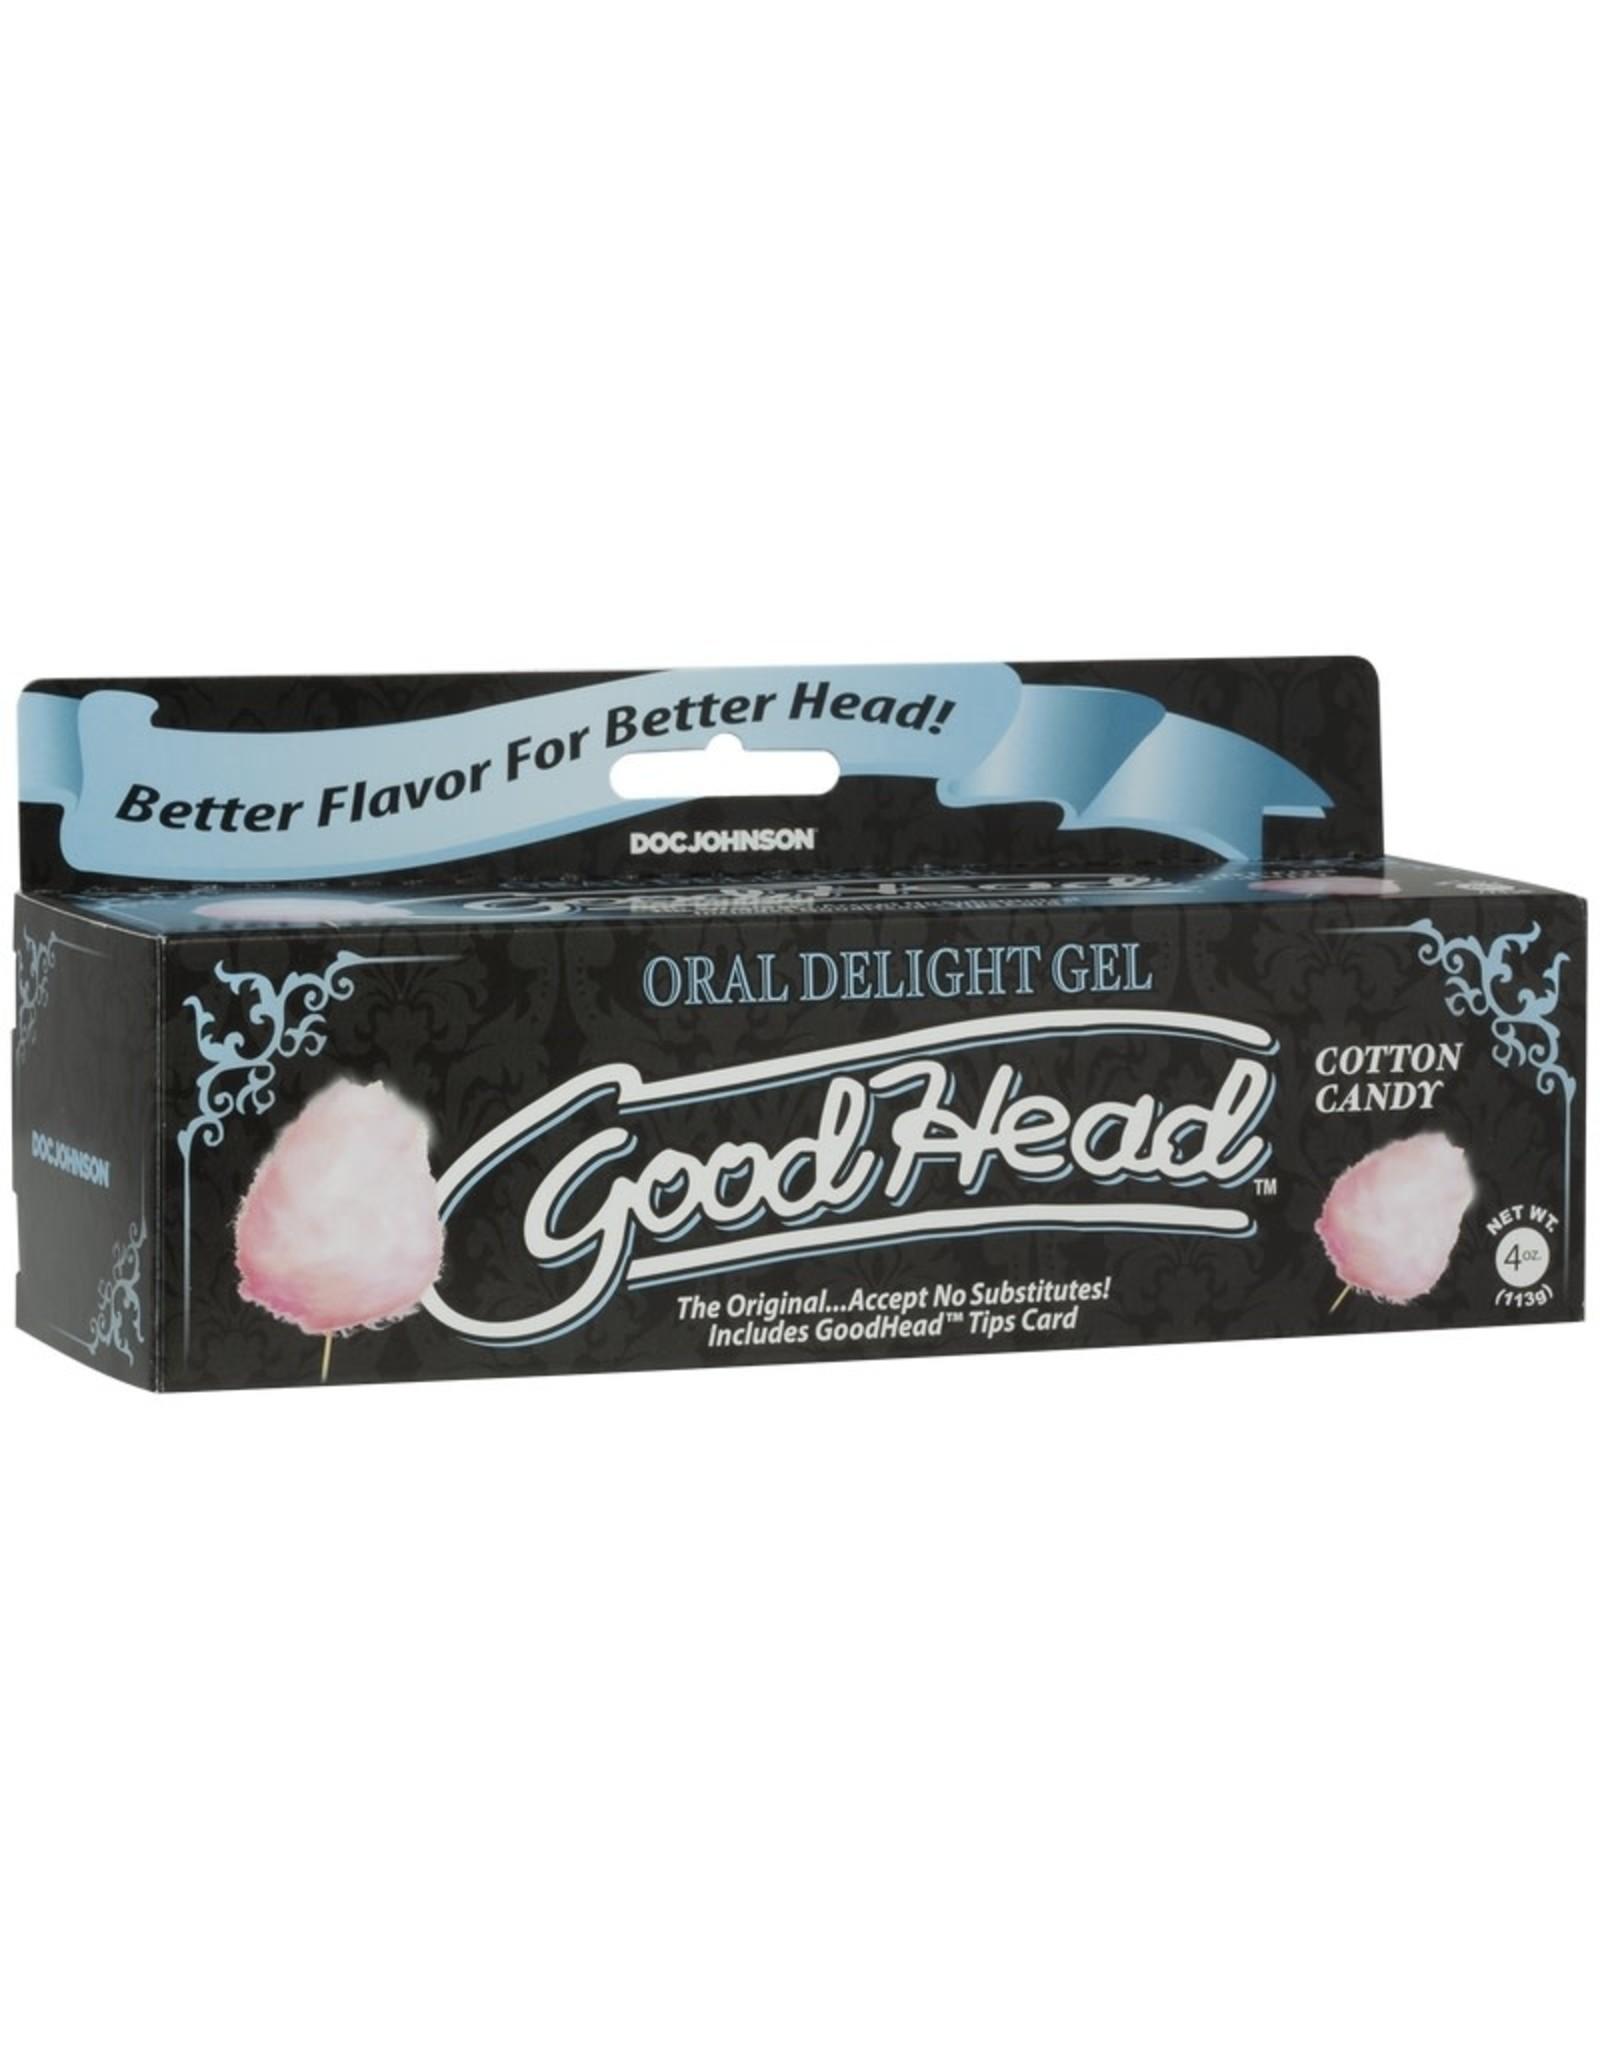 Doc Johnson Good Head Oral Delight Gel - Cotton Candy (4 oz)